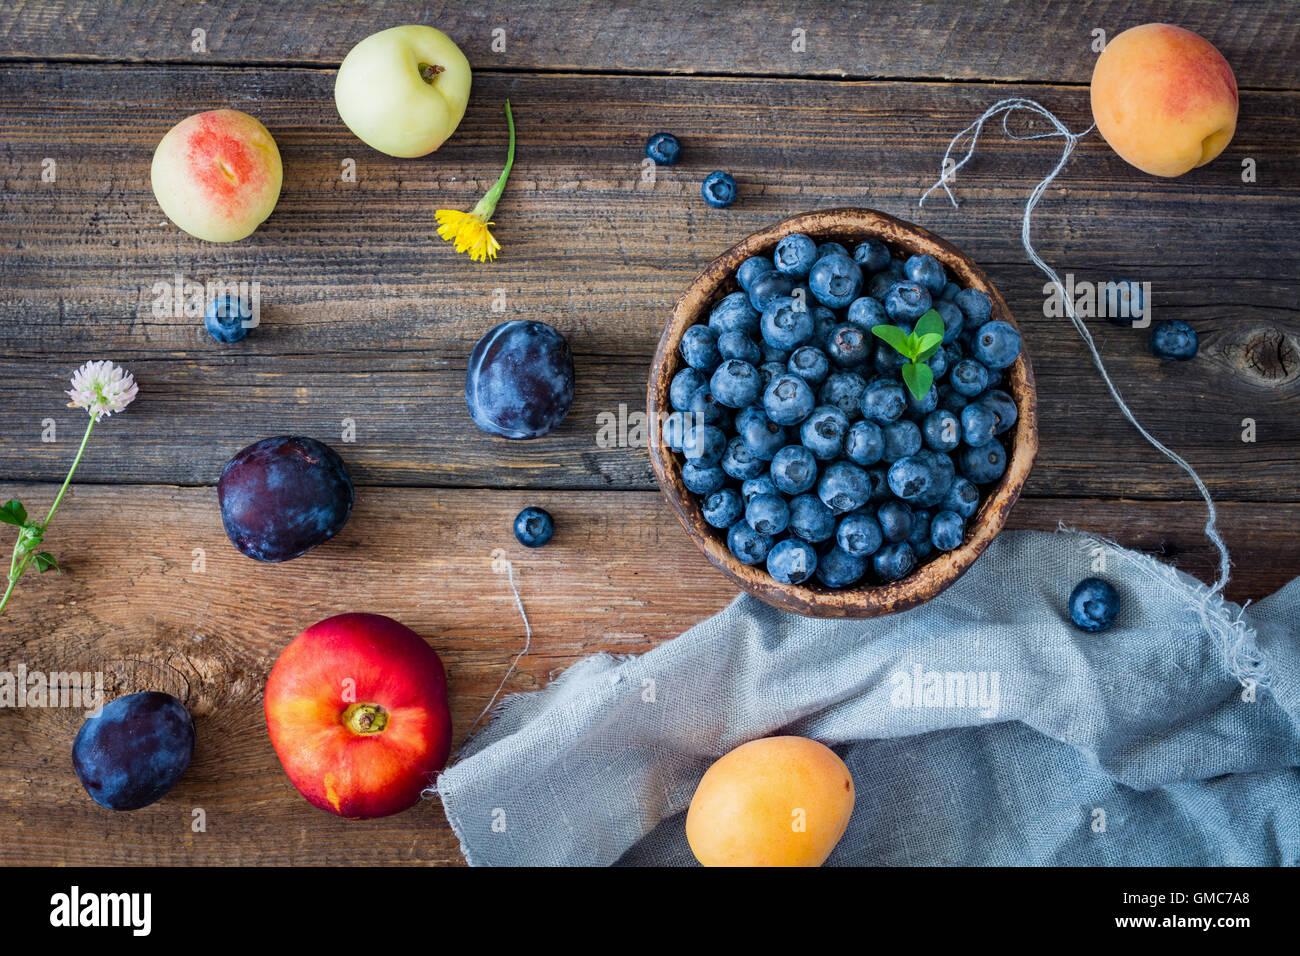 Frutas frescas sobre una mesa de madera. Vista superior Imagen De Stock